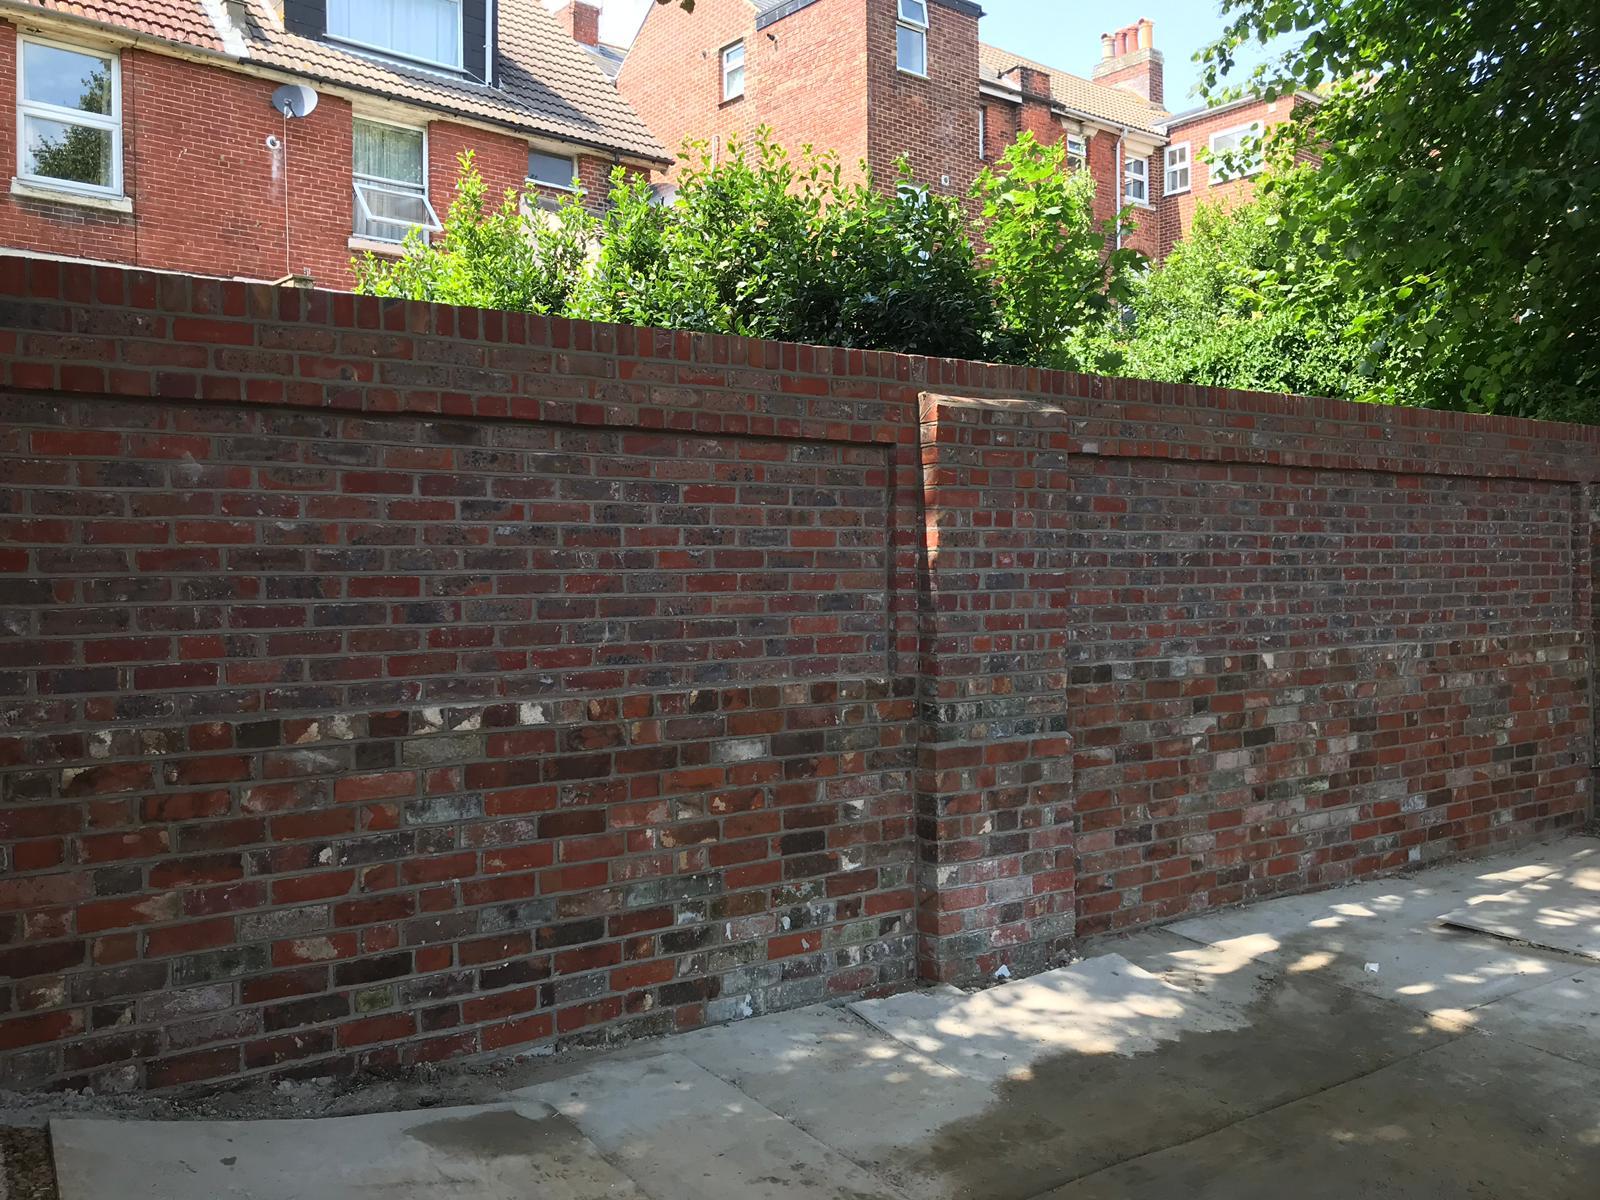 Brick wall after being rebuilt